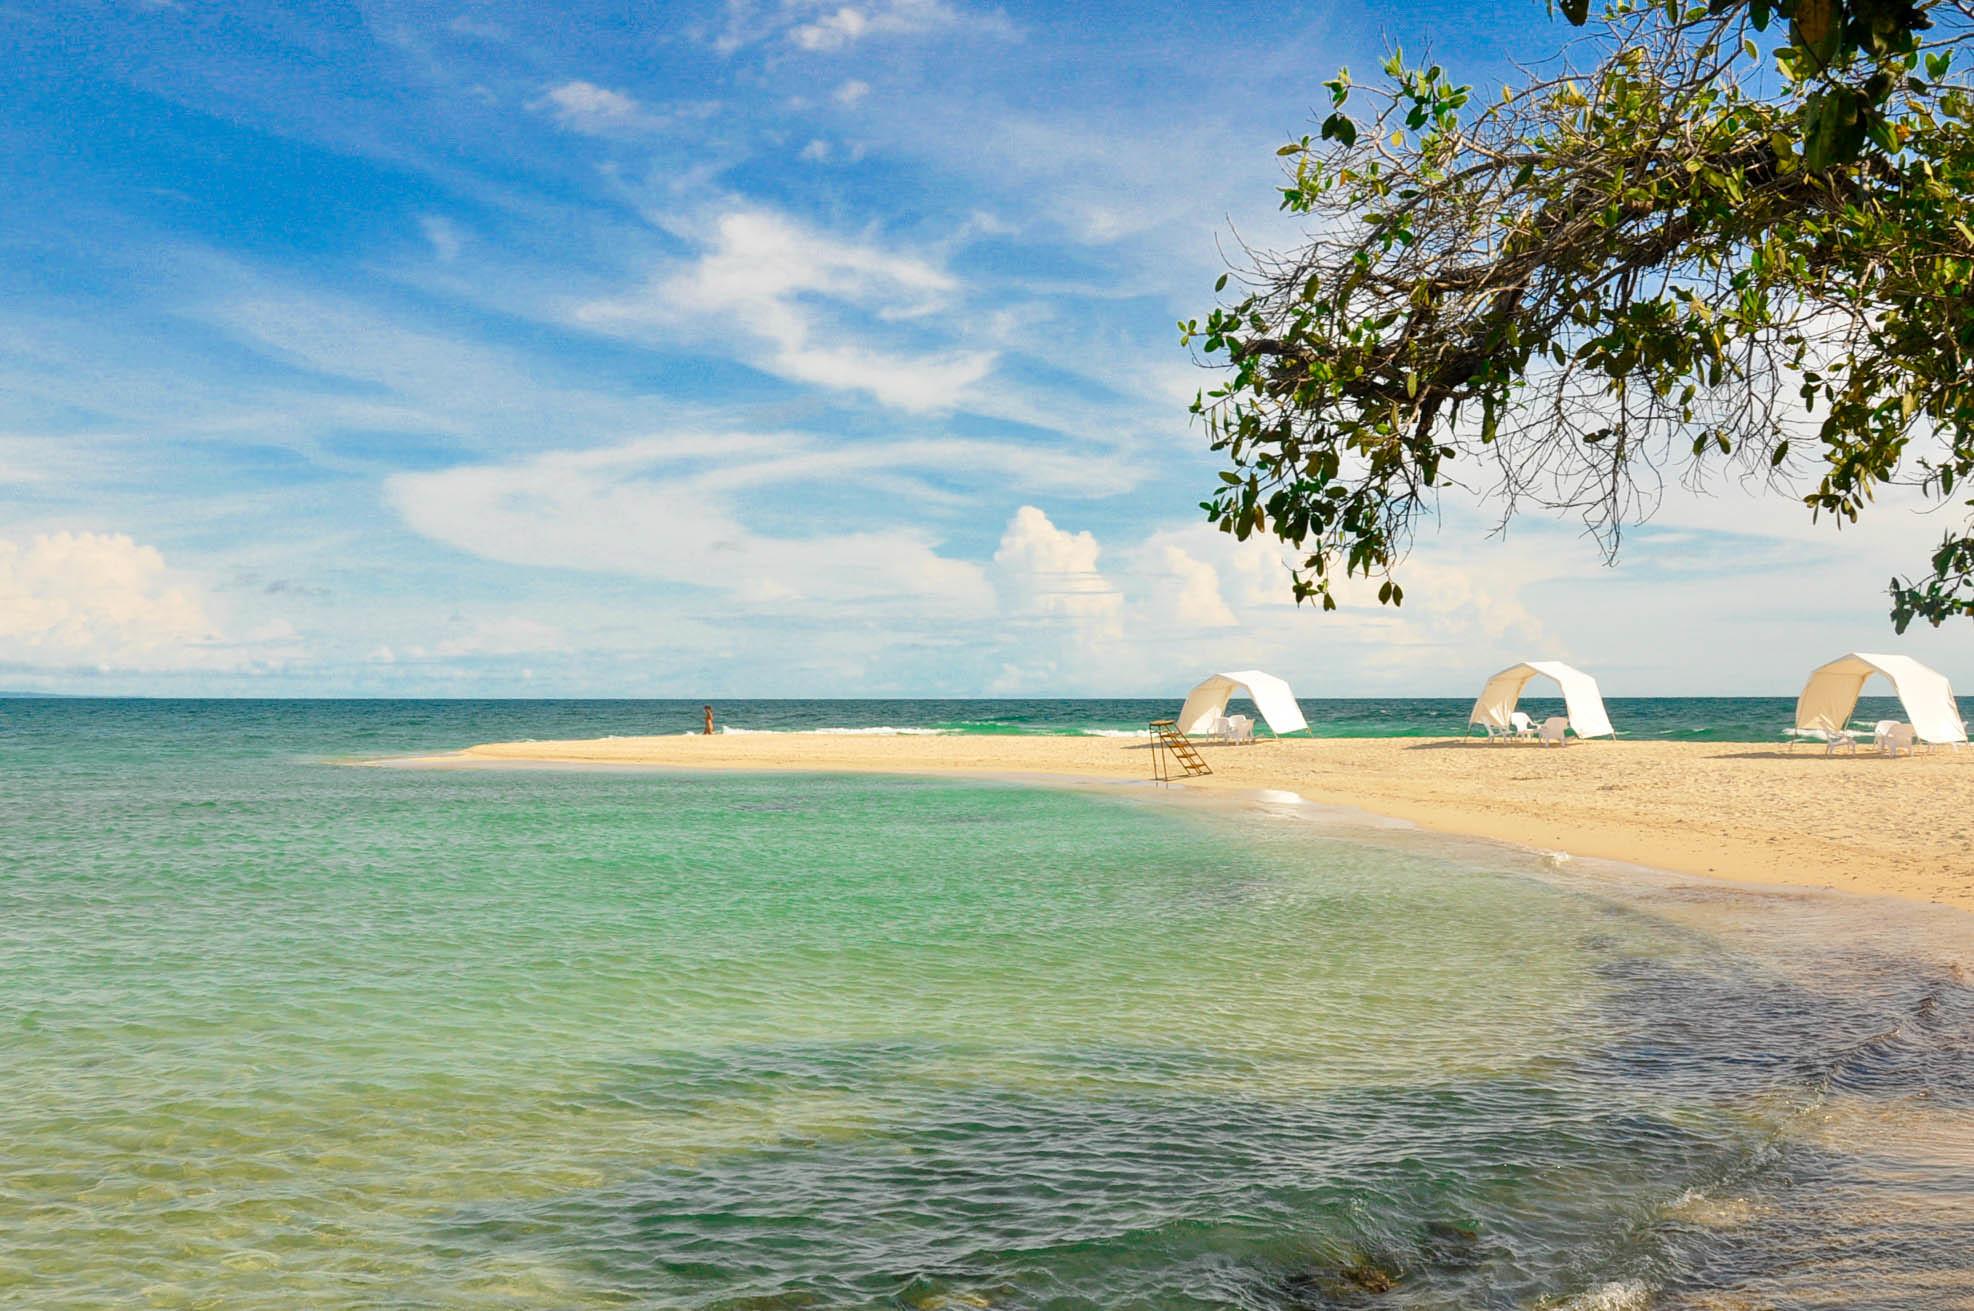 Bendita Beach - Island Day Trip from Cartagena